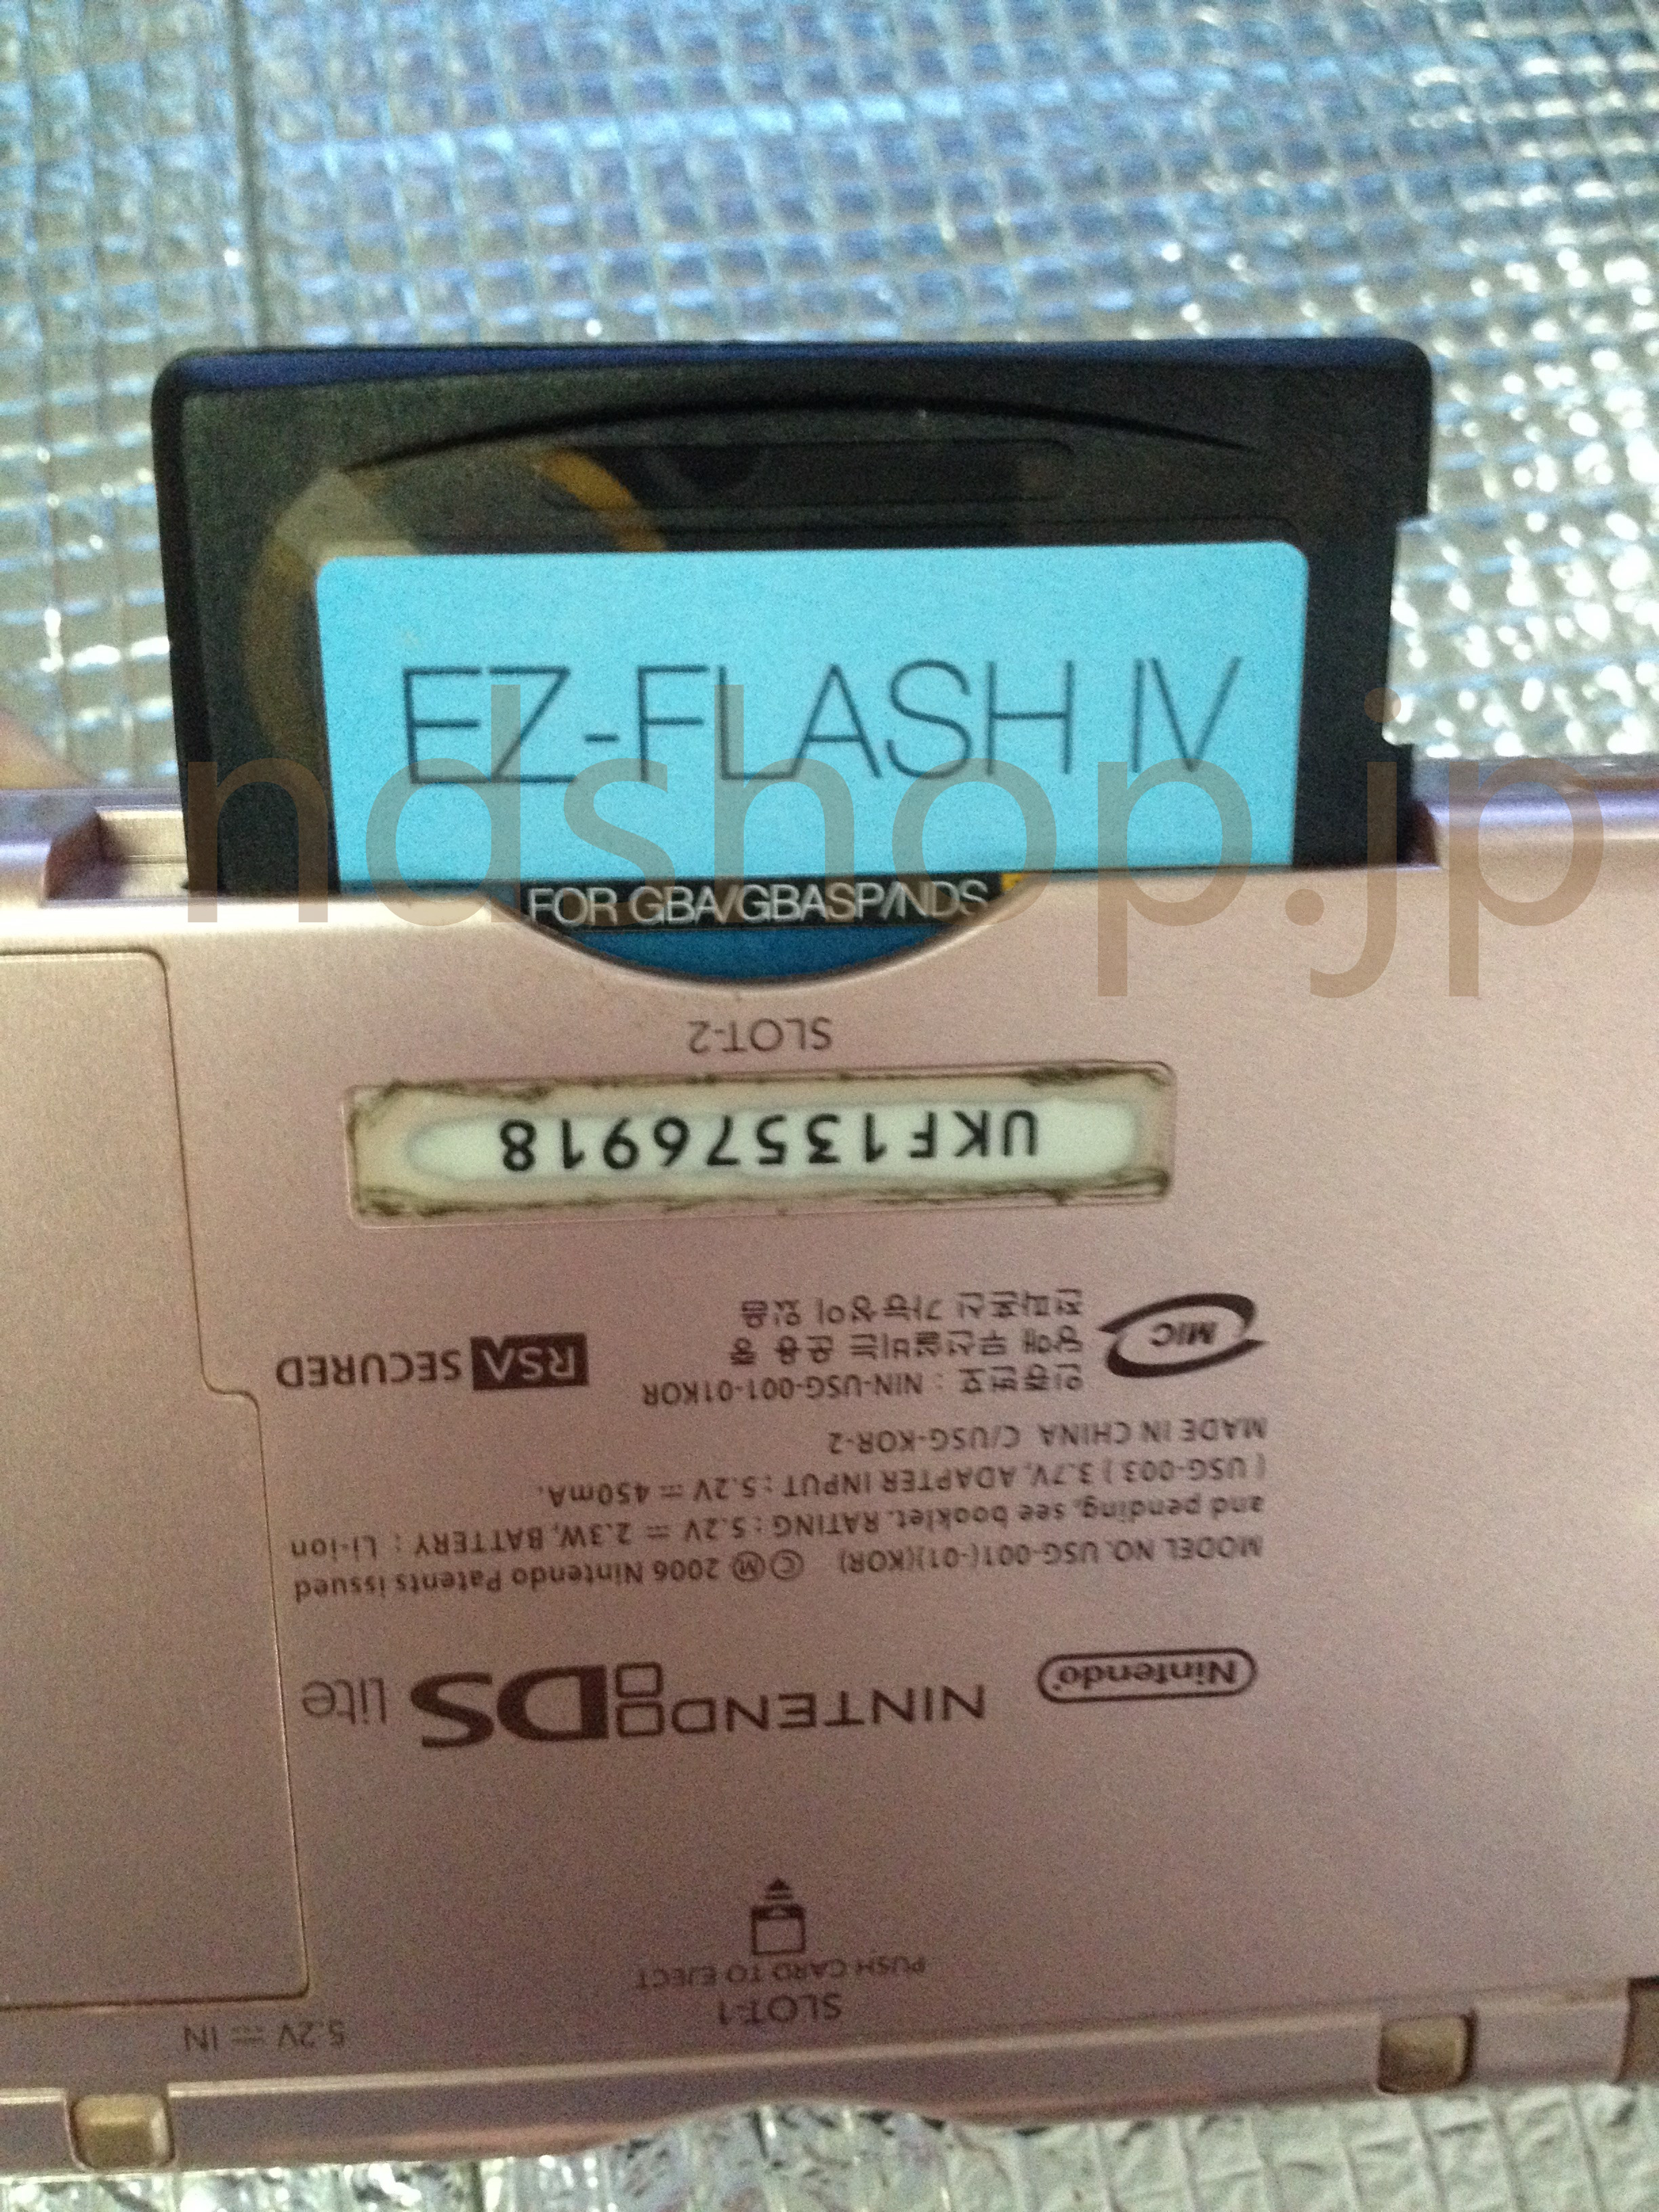 EZFLASHIV0617009